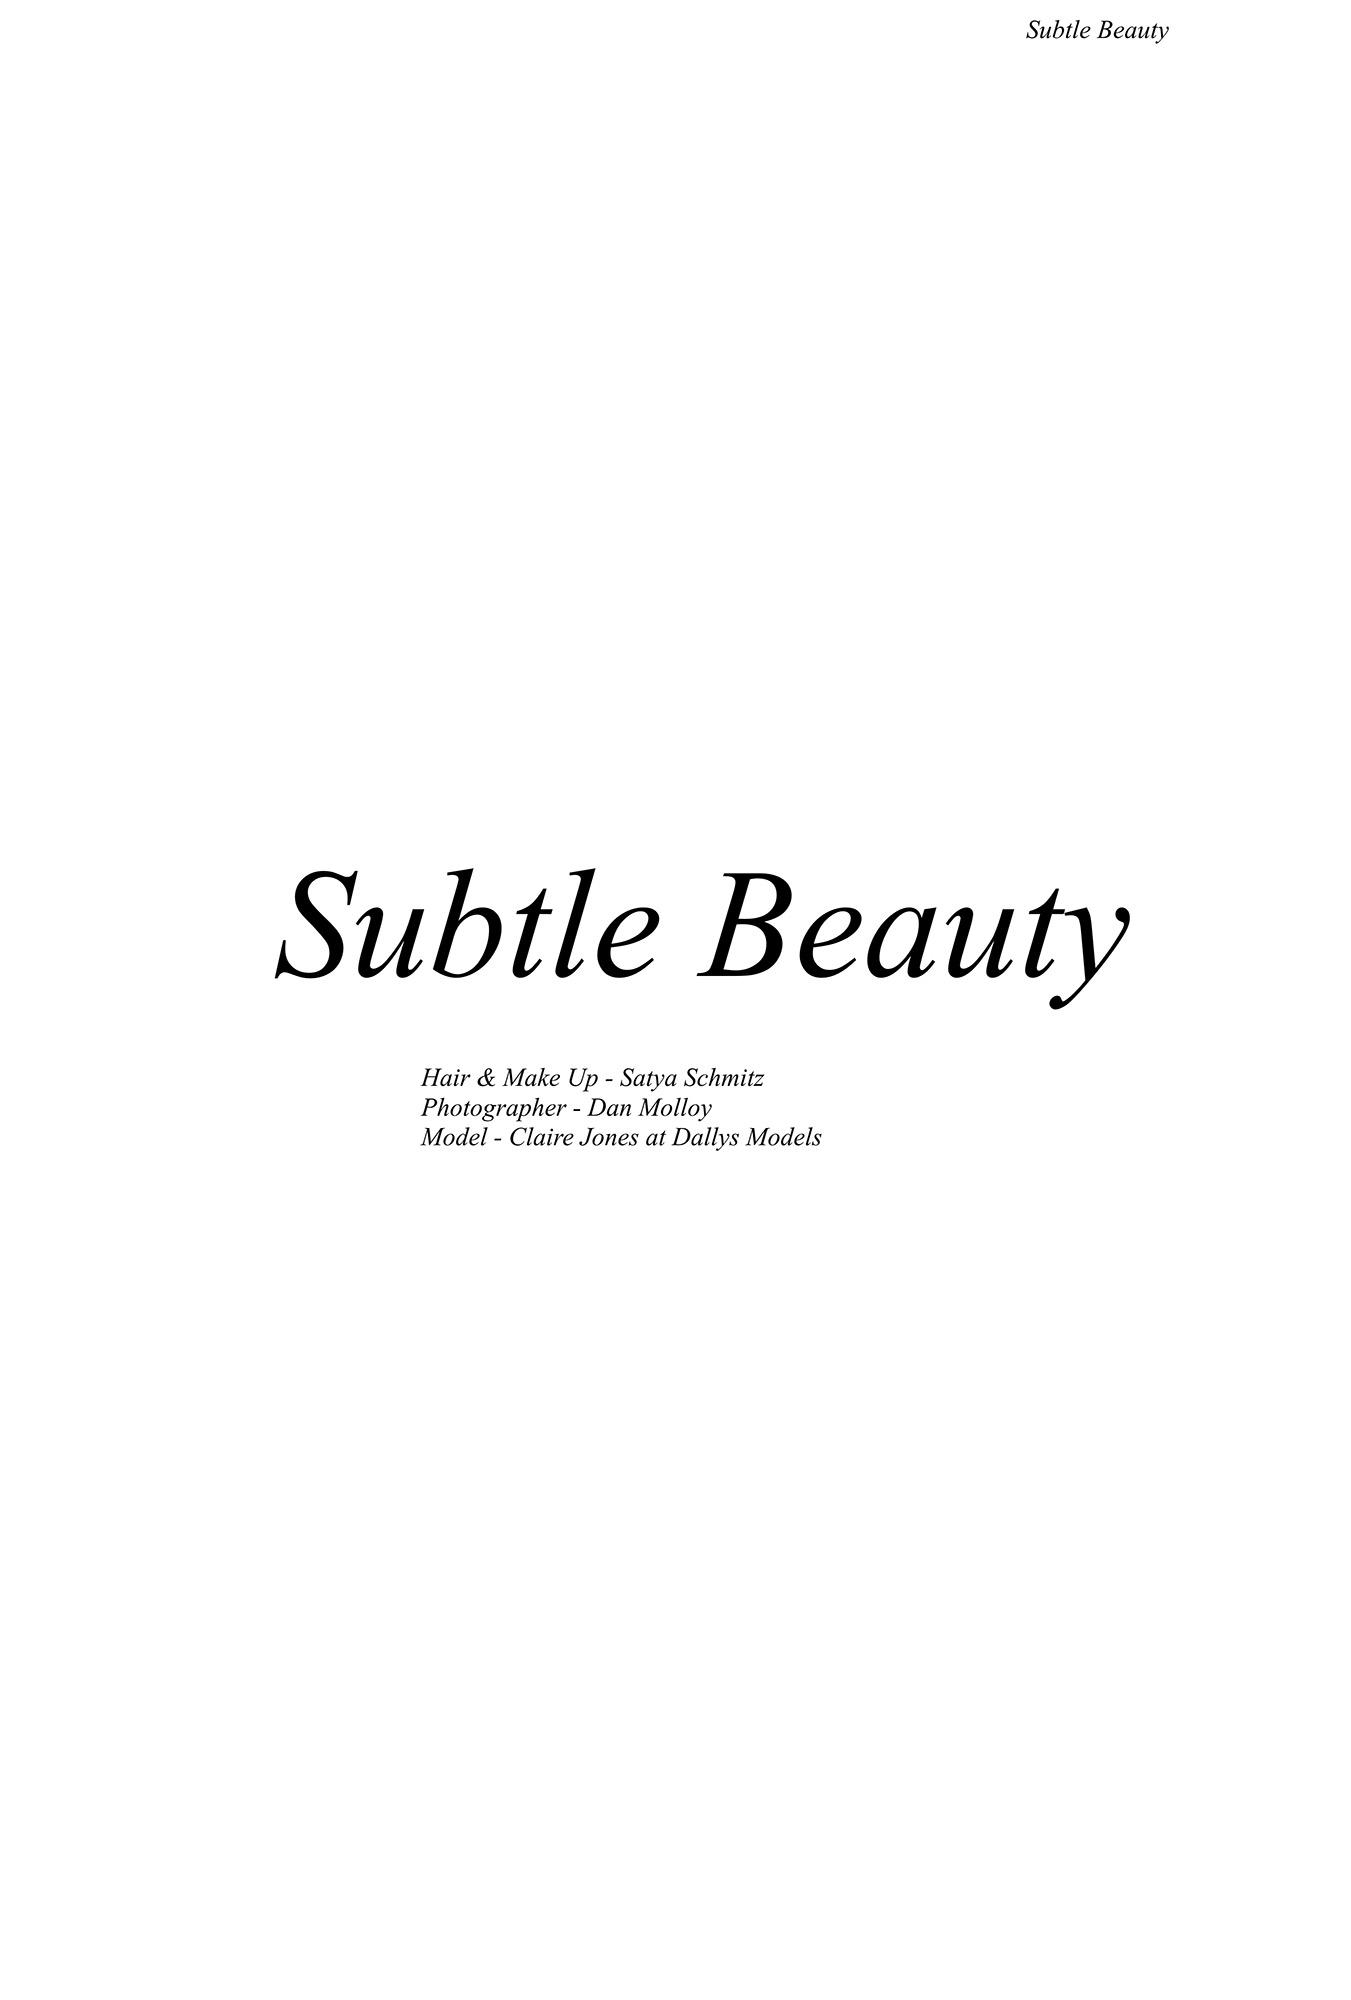 Flawless-Magazine_Subtle-Beauty1c.jpg